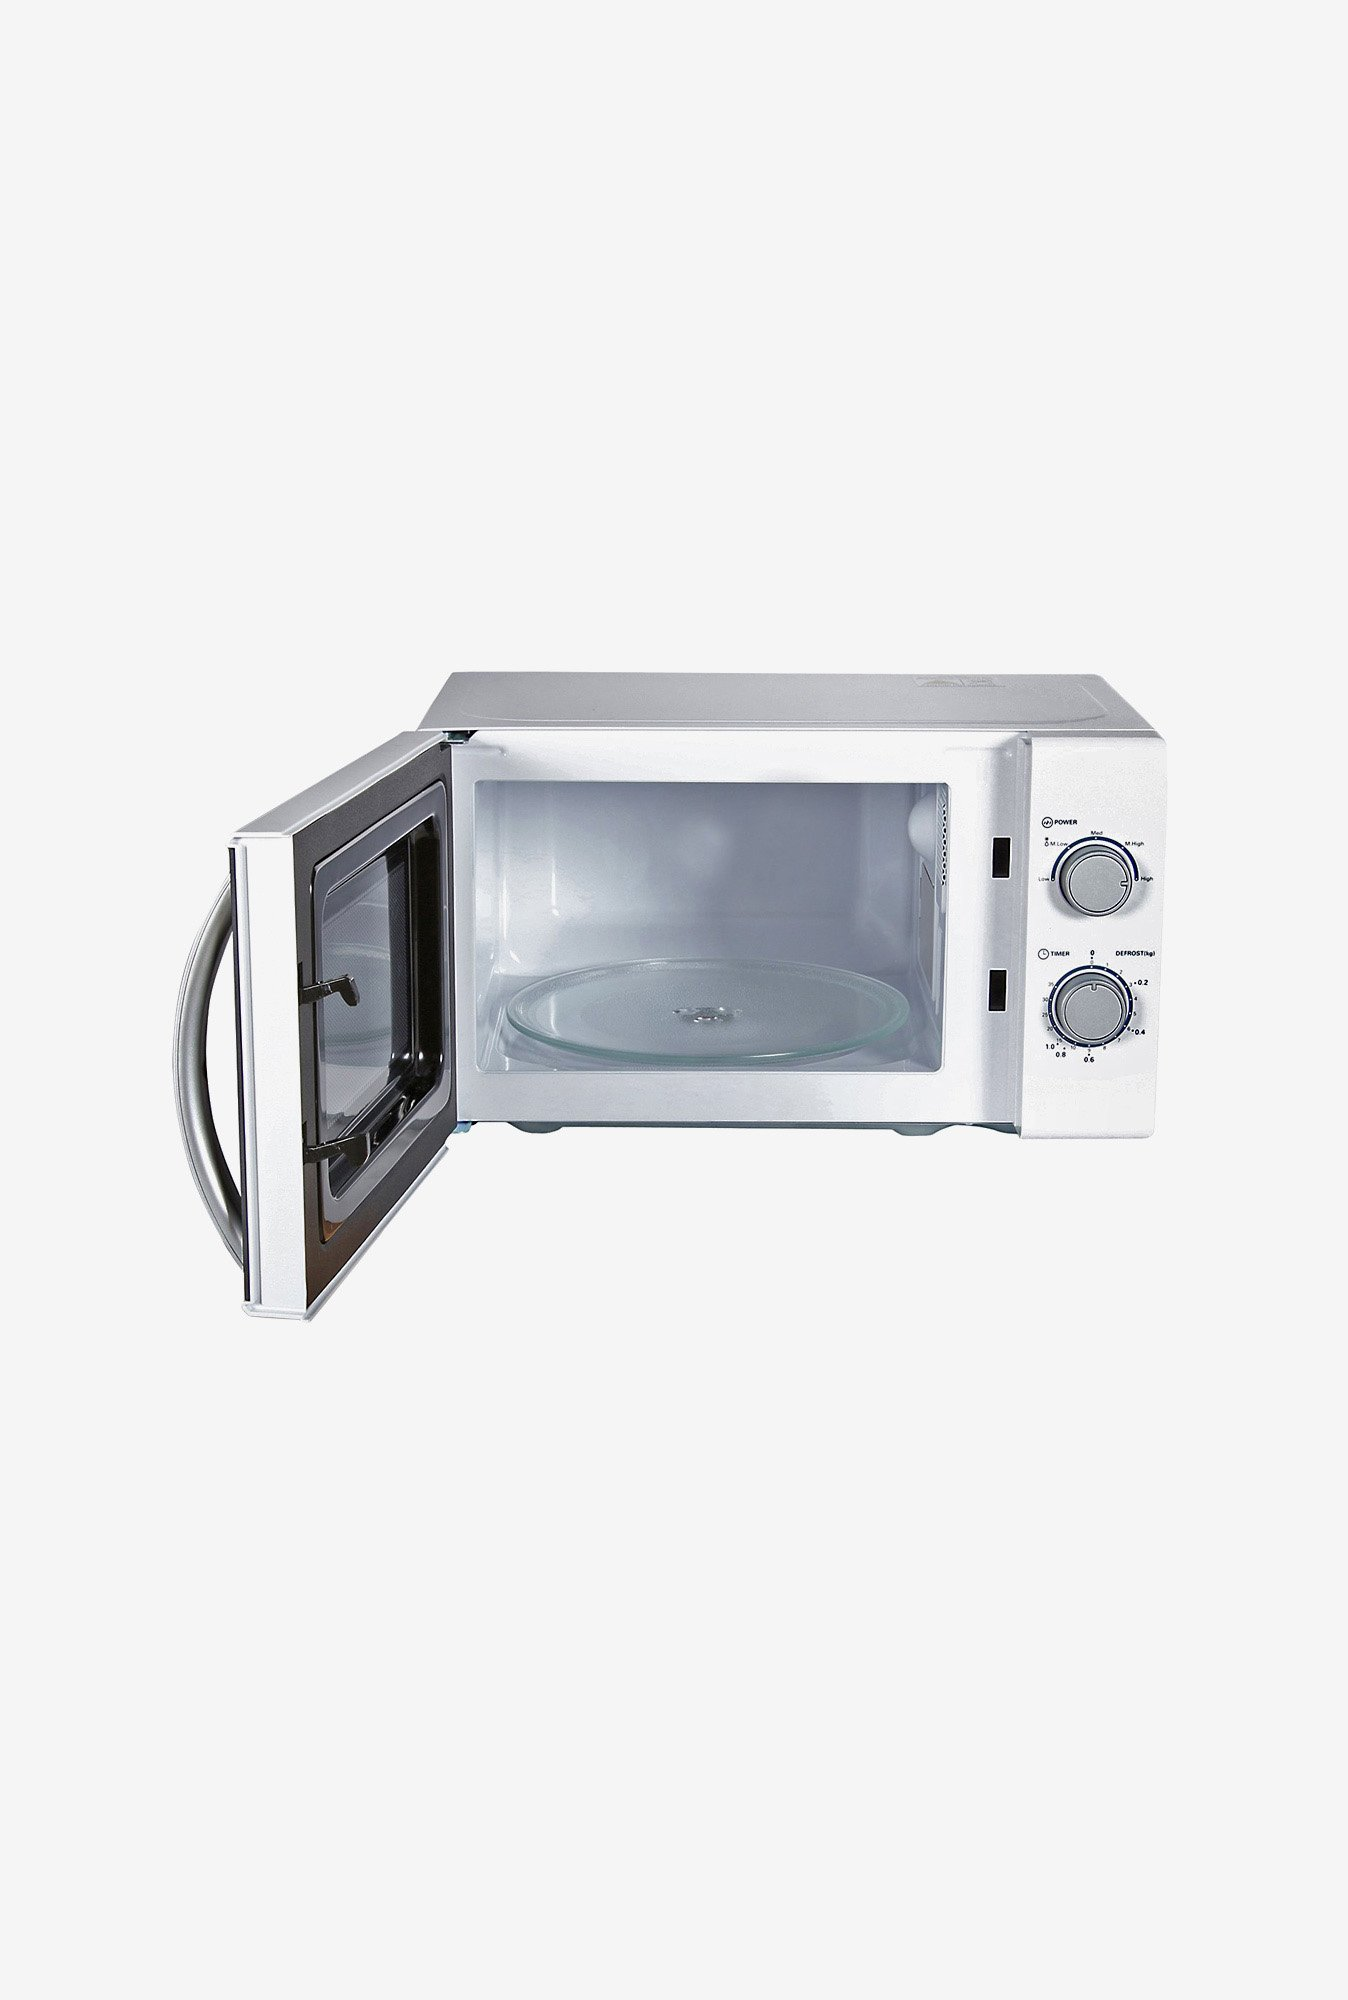 Kenstar KM20SWWN 17 Litres Solo Microwave Oven